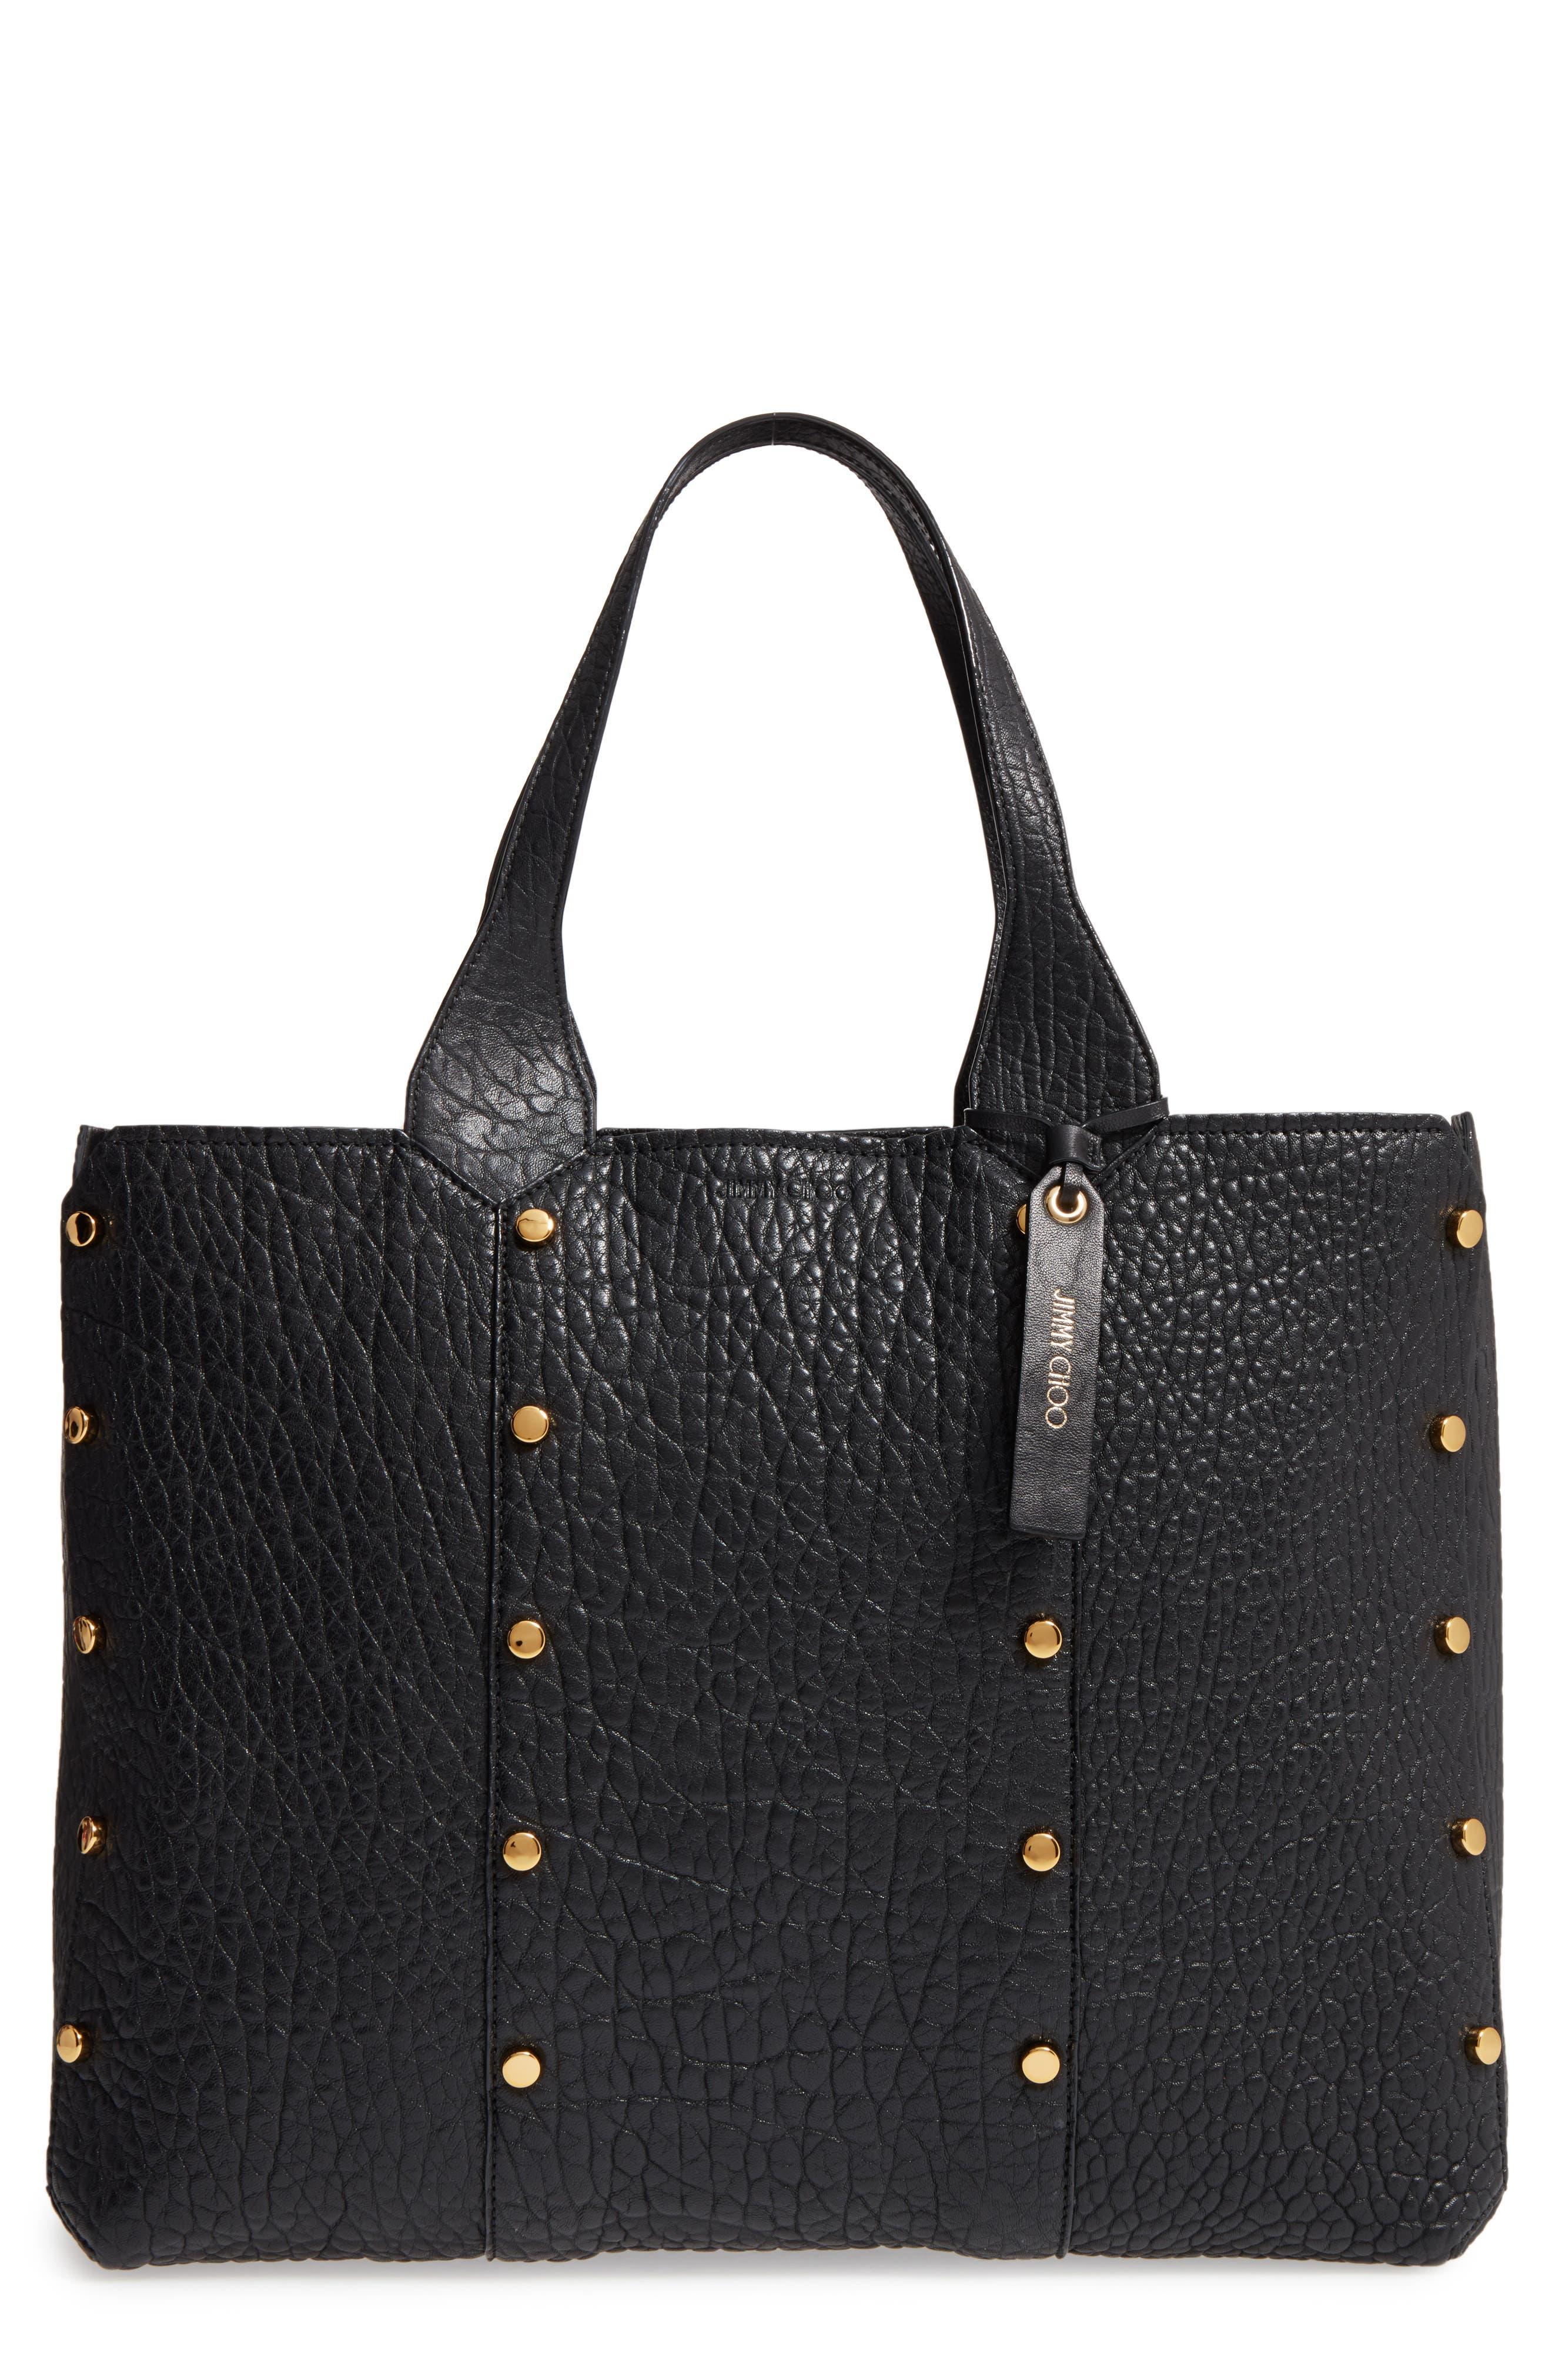 Alternate Image 1 Selected - Jimmy Choo Lockett Leather Shopper